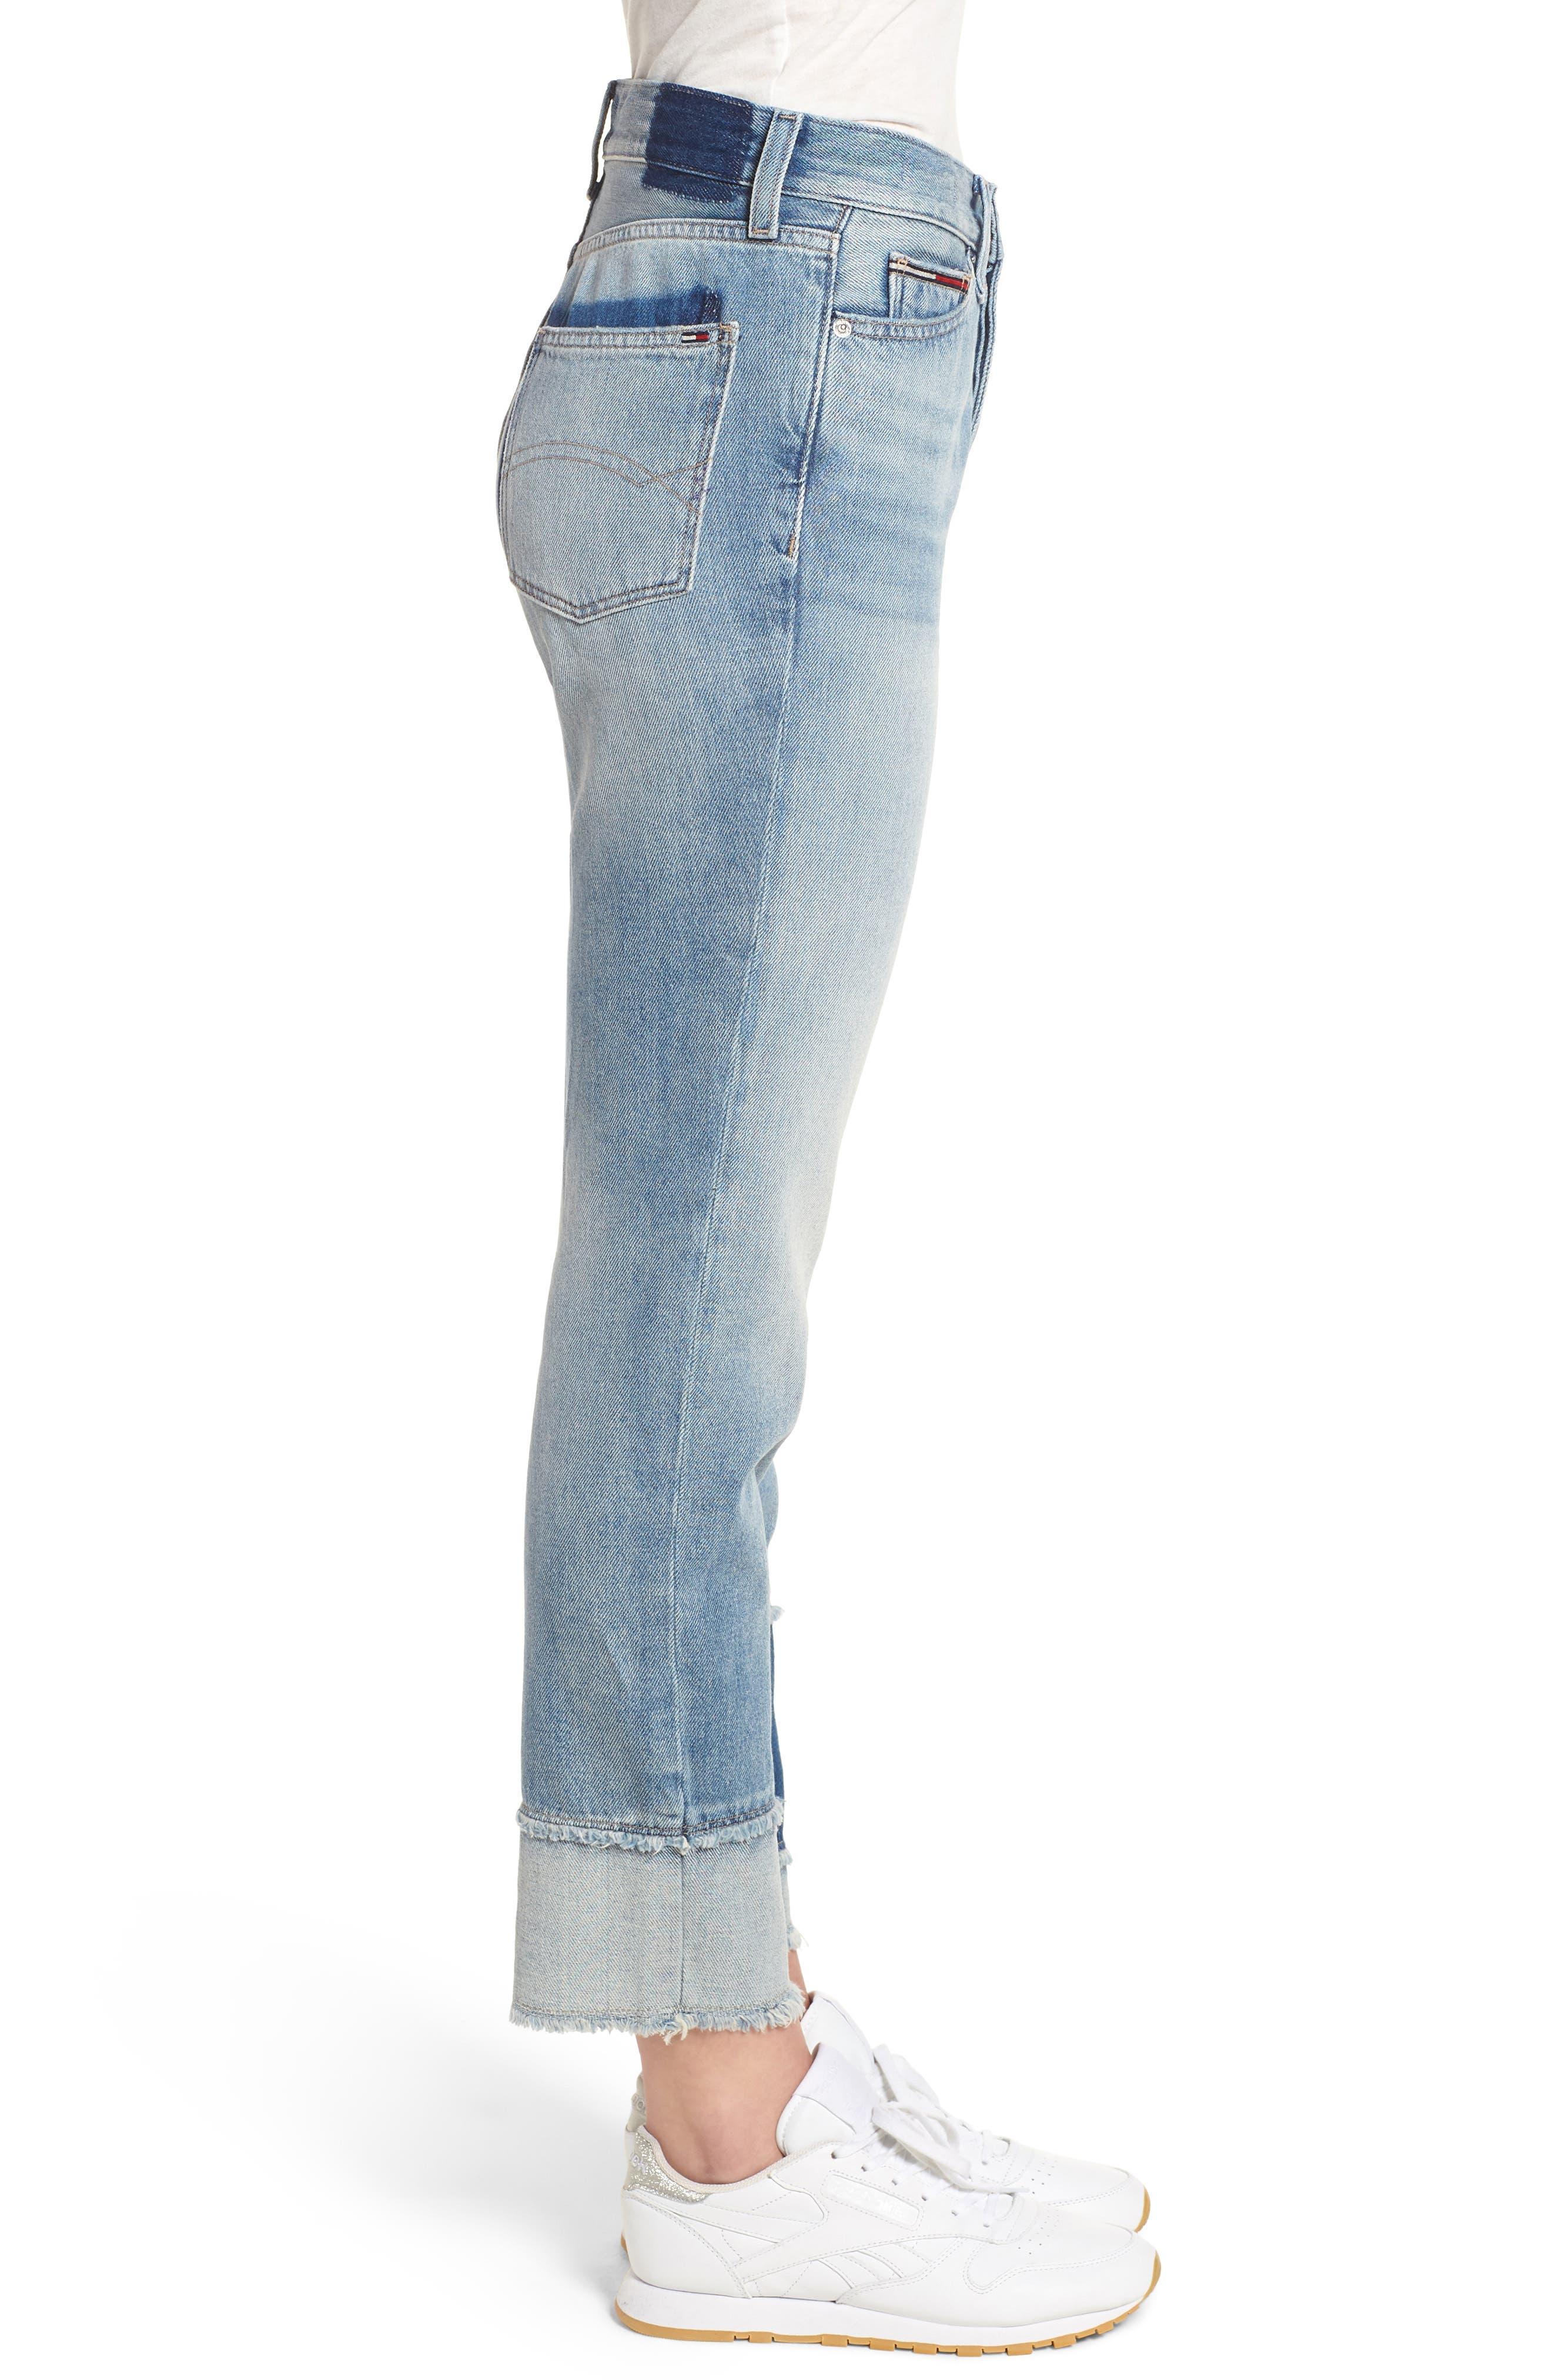 Izzy Layered Cuff Slim Leg Jeans,                             Alternate thumbnail 3, color,                             Raw Patch Light Blue Rigid